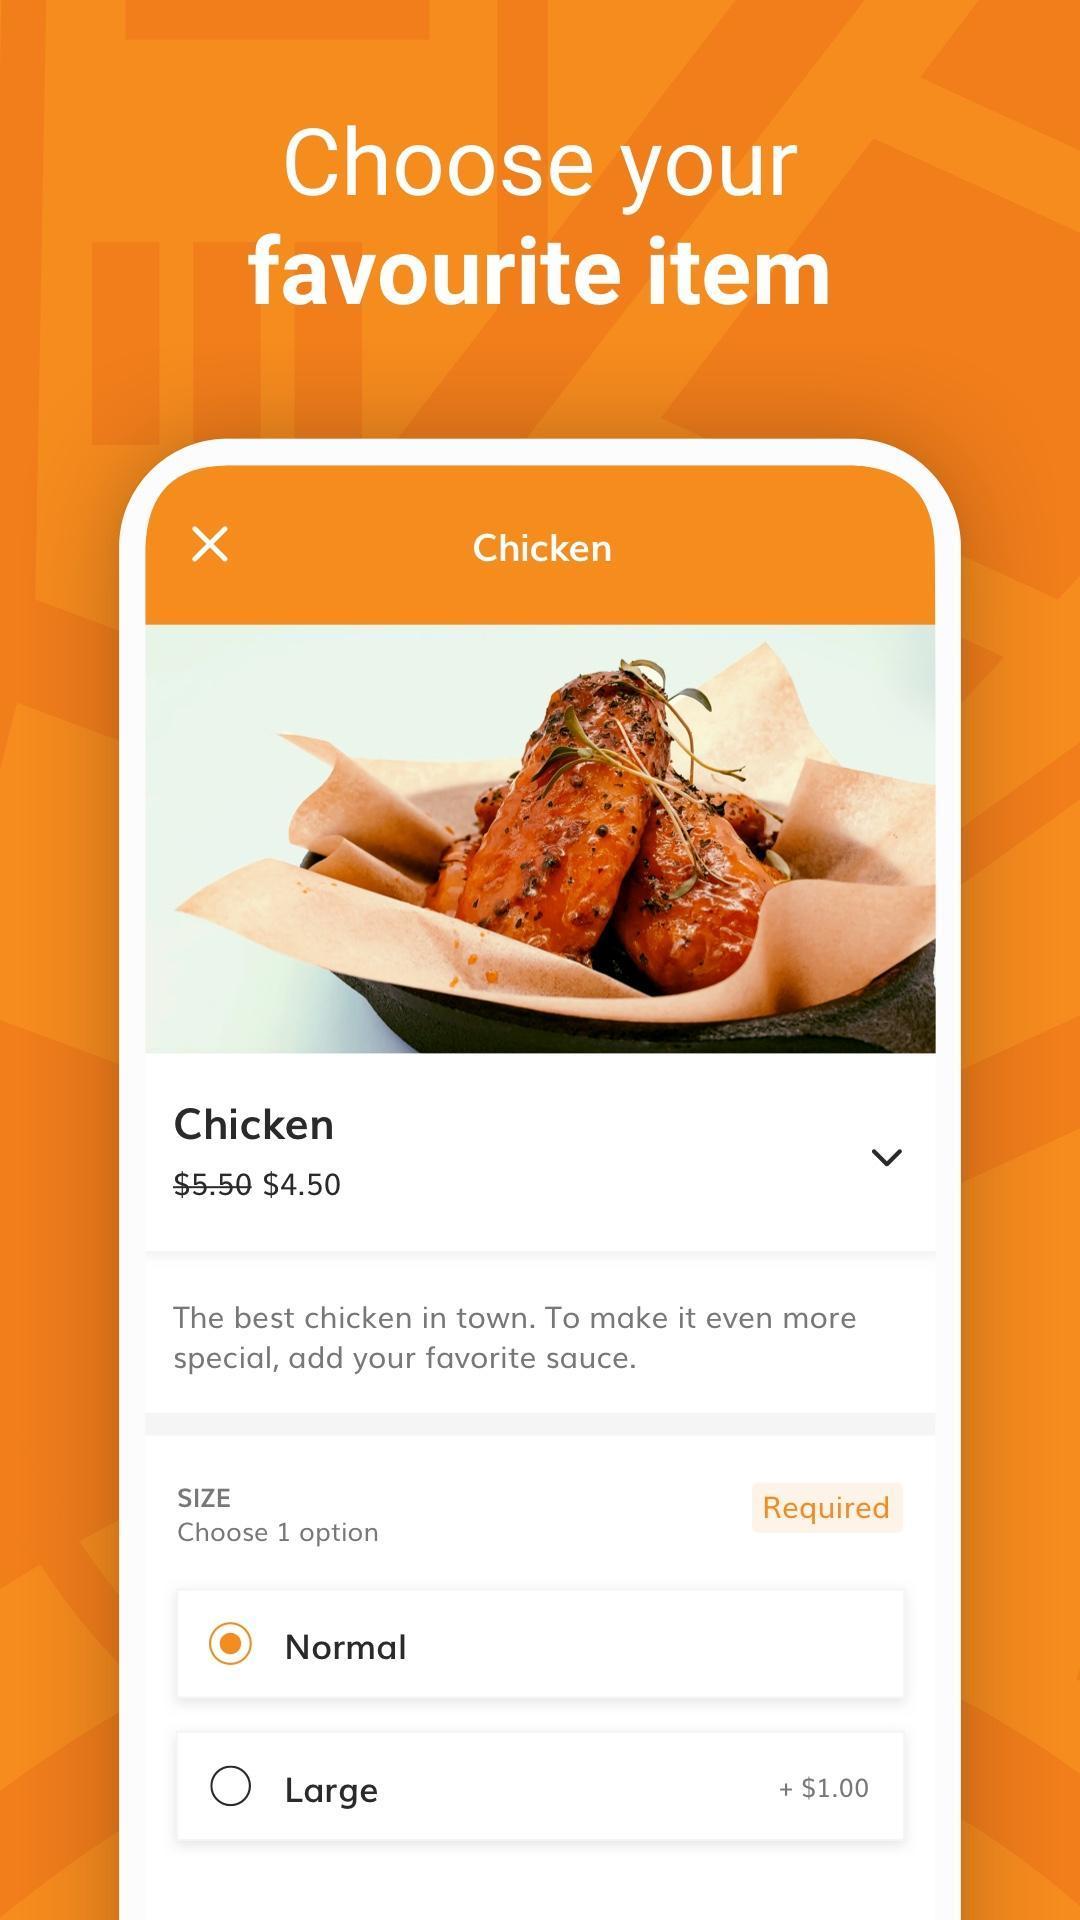 Jumia Food Local Food Delivery near You 4.3.1 Screenshot 4